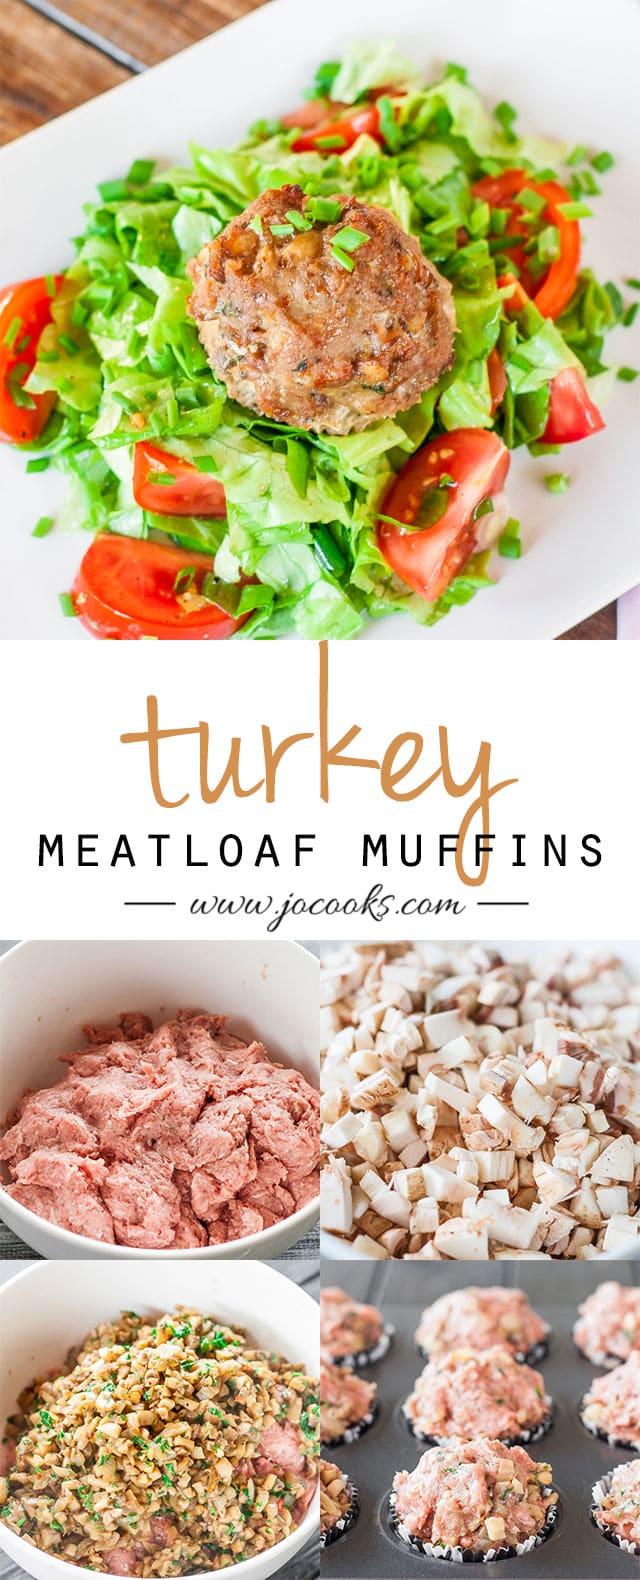 turkey-meatloaf-muffins-collage